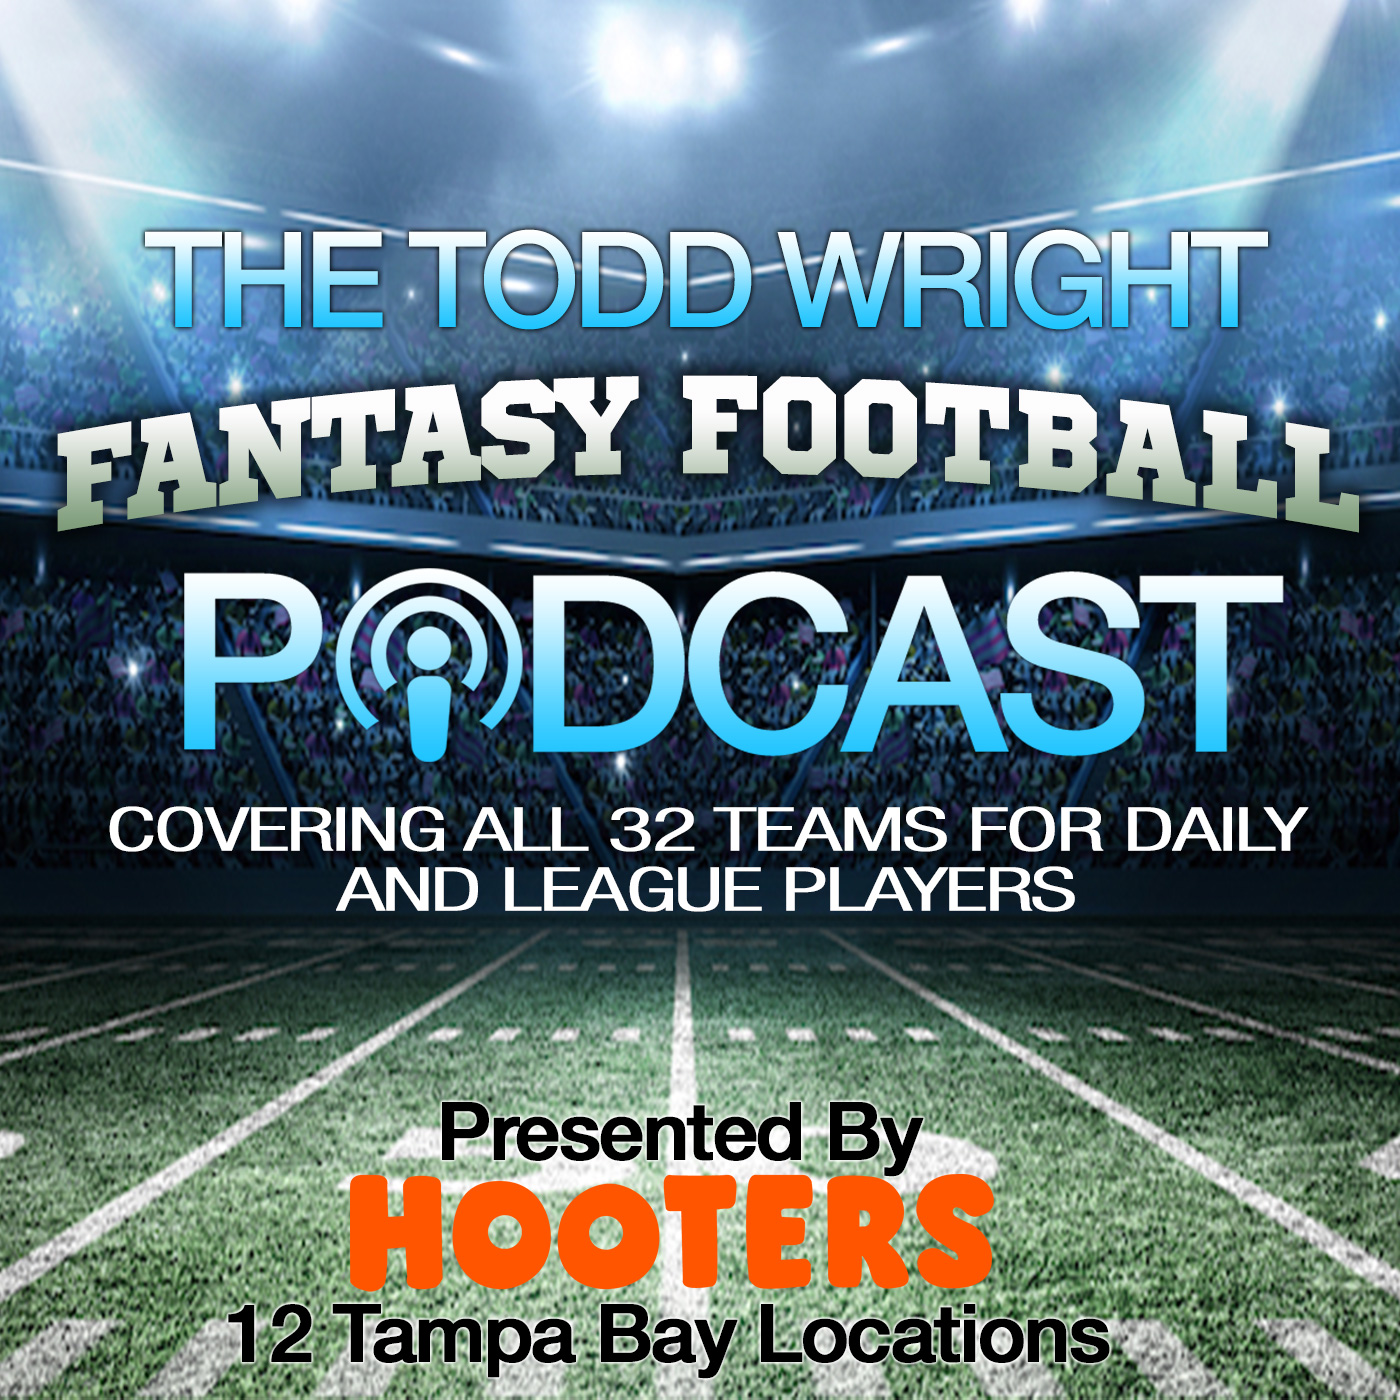 Todd Wright Fantasy Football Podcast -- For Daily & Season Players